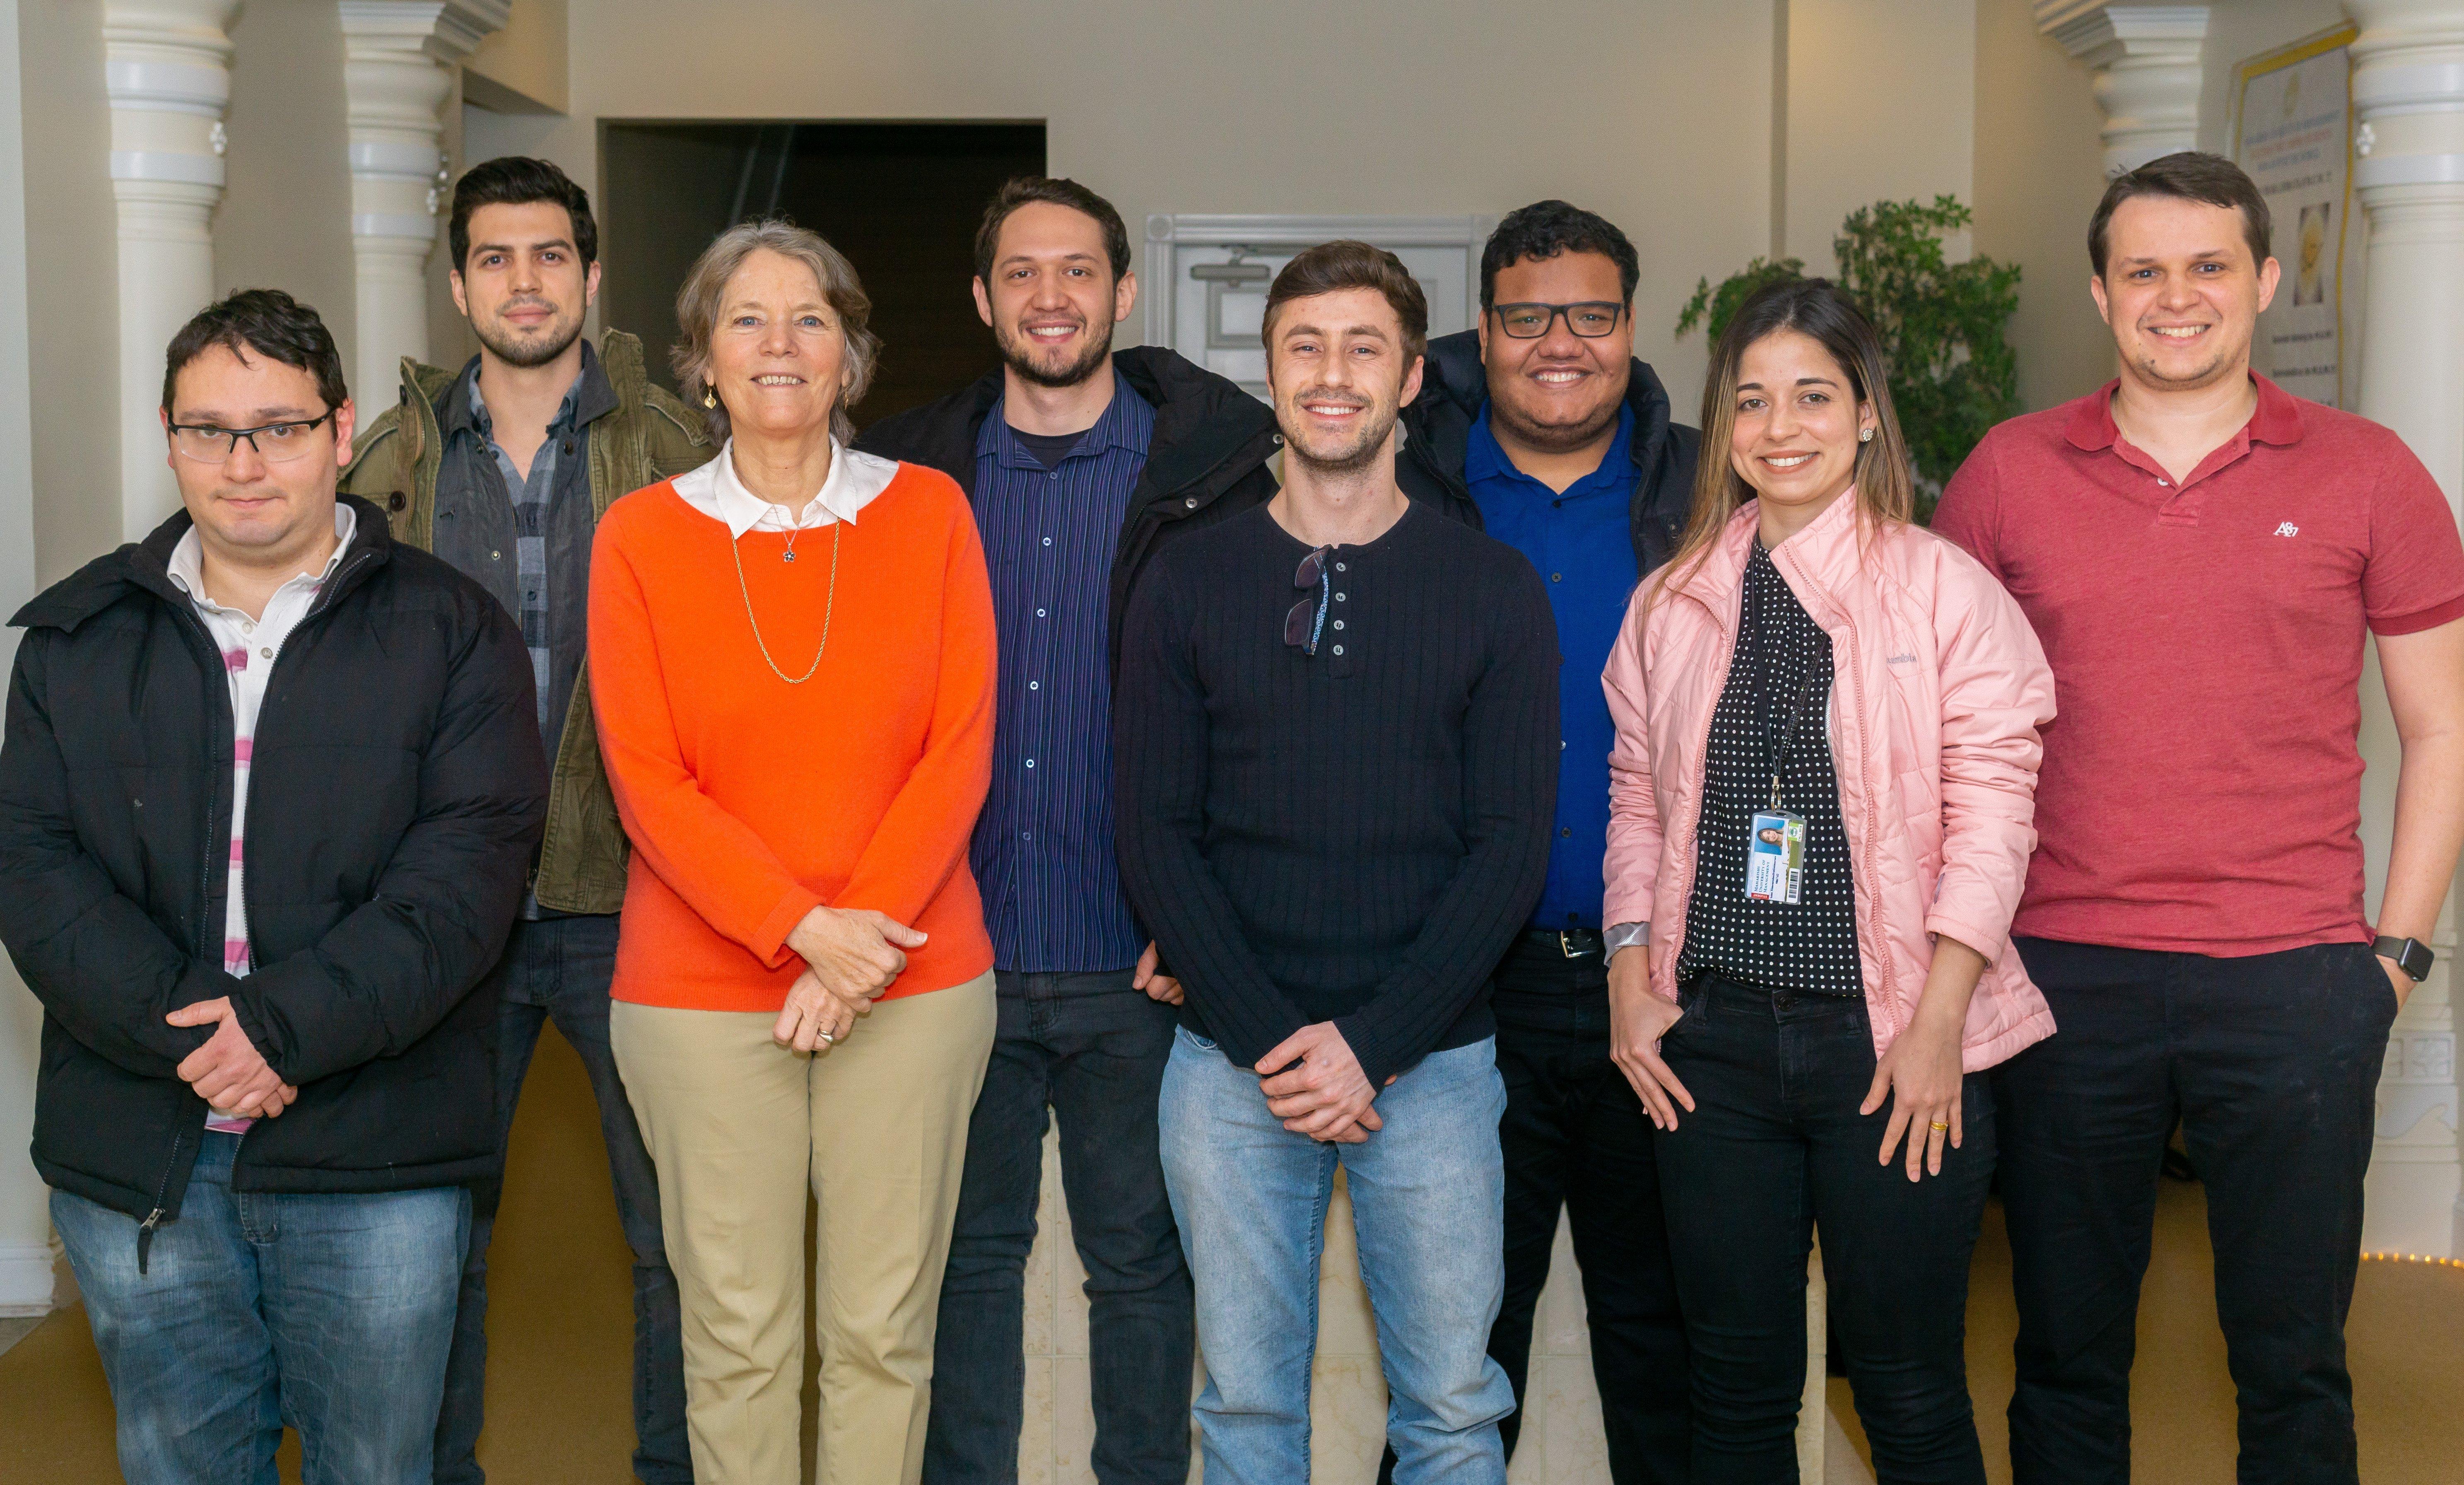 Studenti MS di informatica brasiliana con Elaine Guthrie